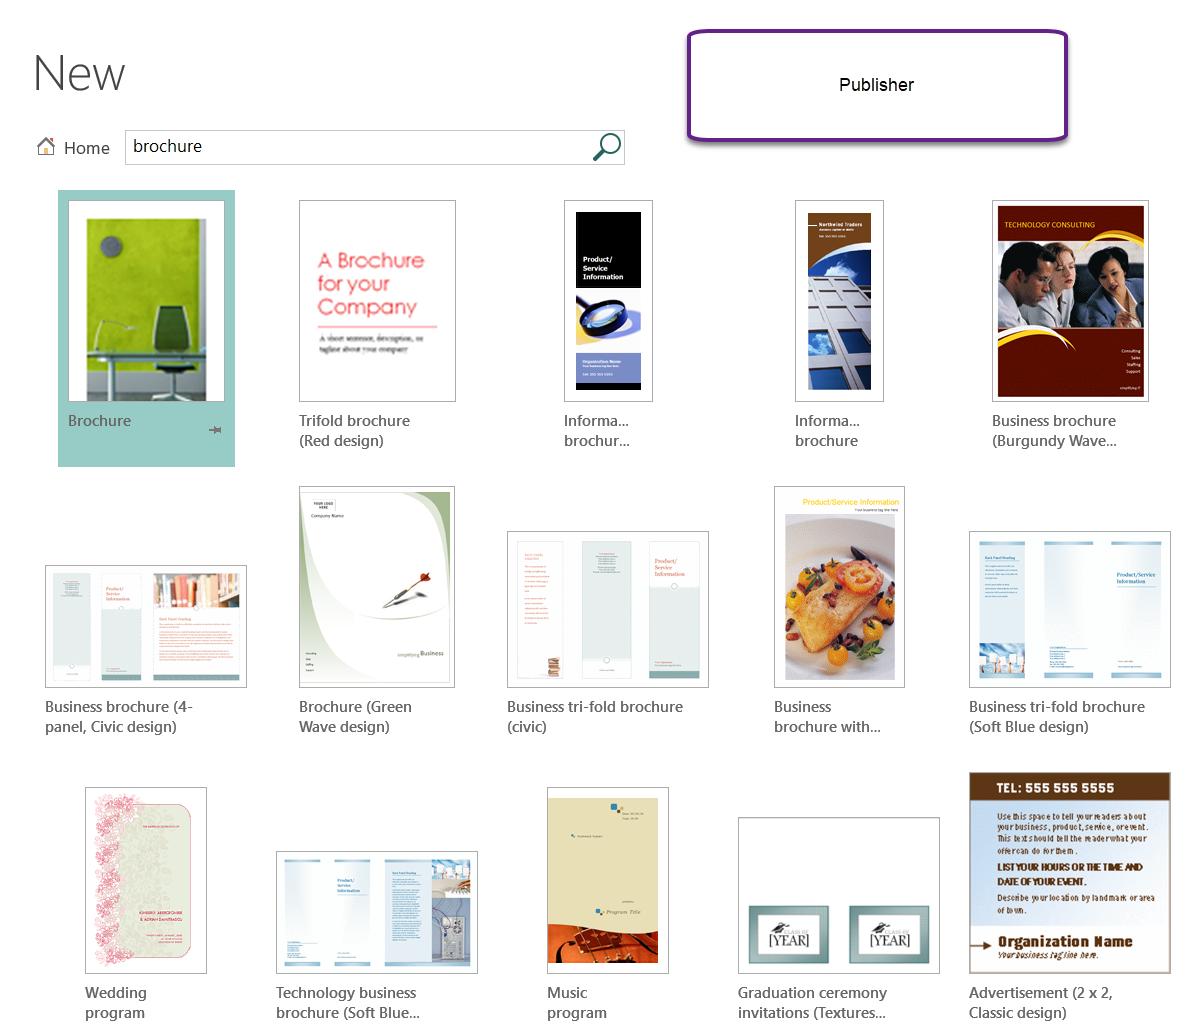 Microsoft Powerpoint Designs: Brochure Template In Powerpoint